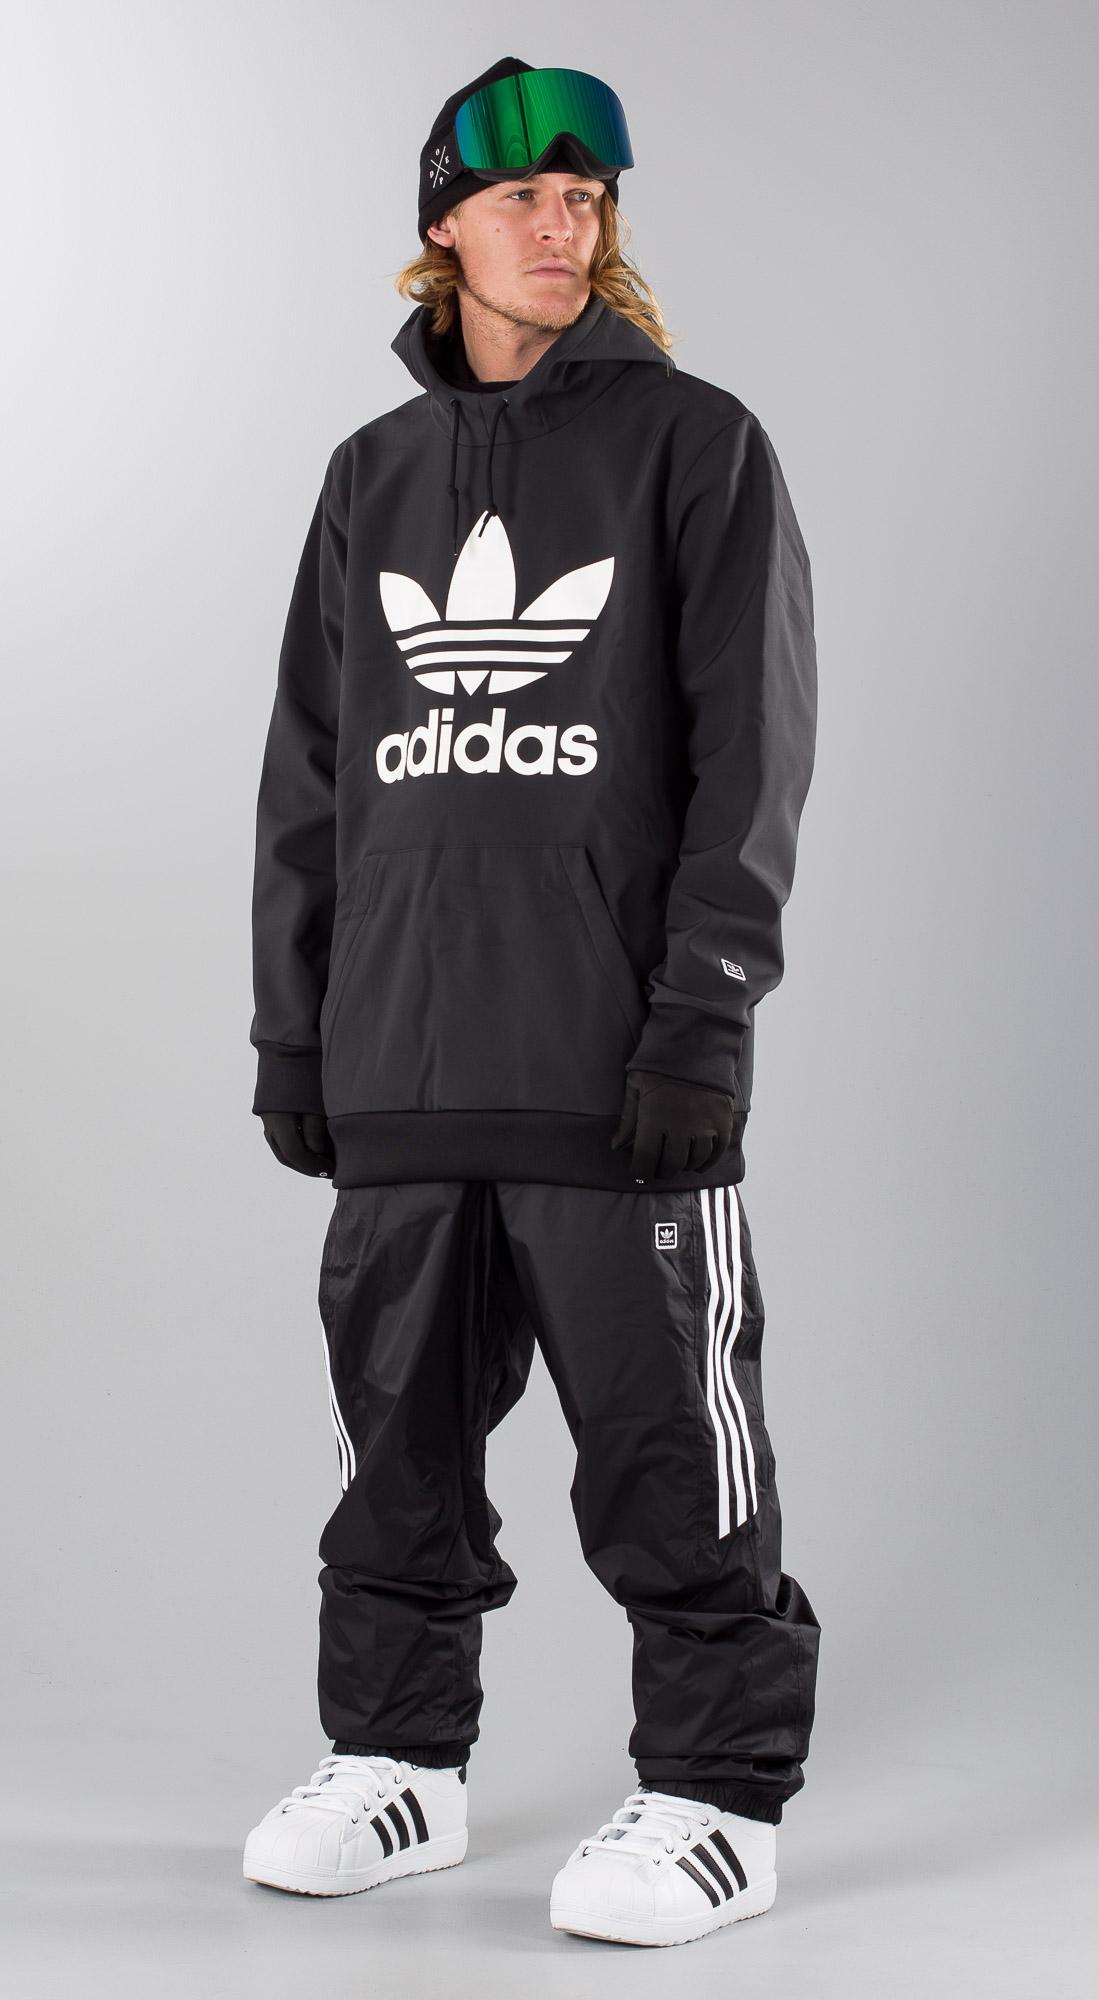 Adidas Team Tech Hoodie, blackwhite Hoody